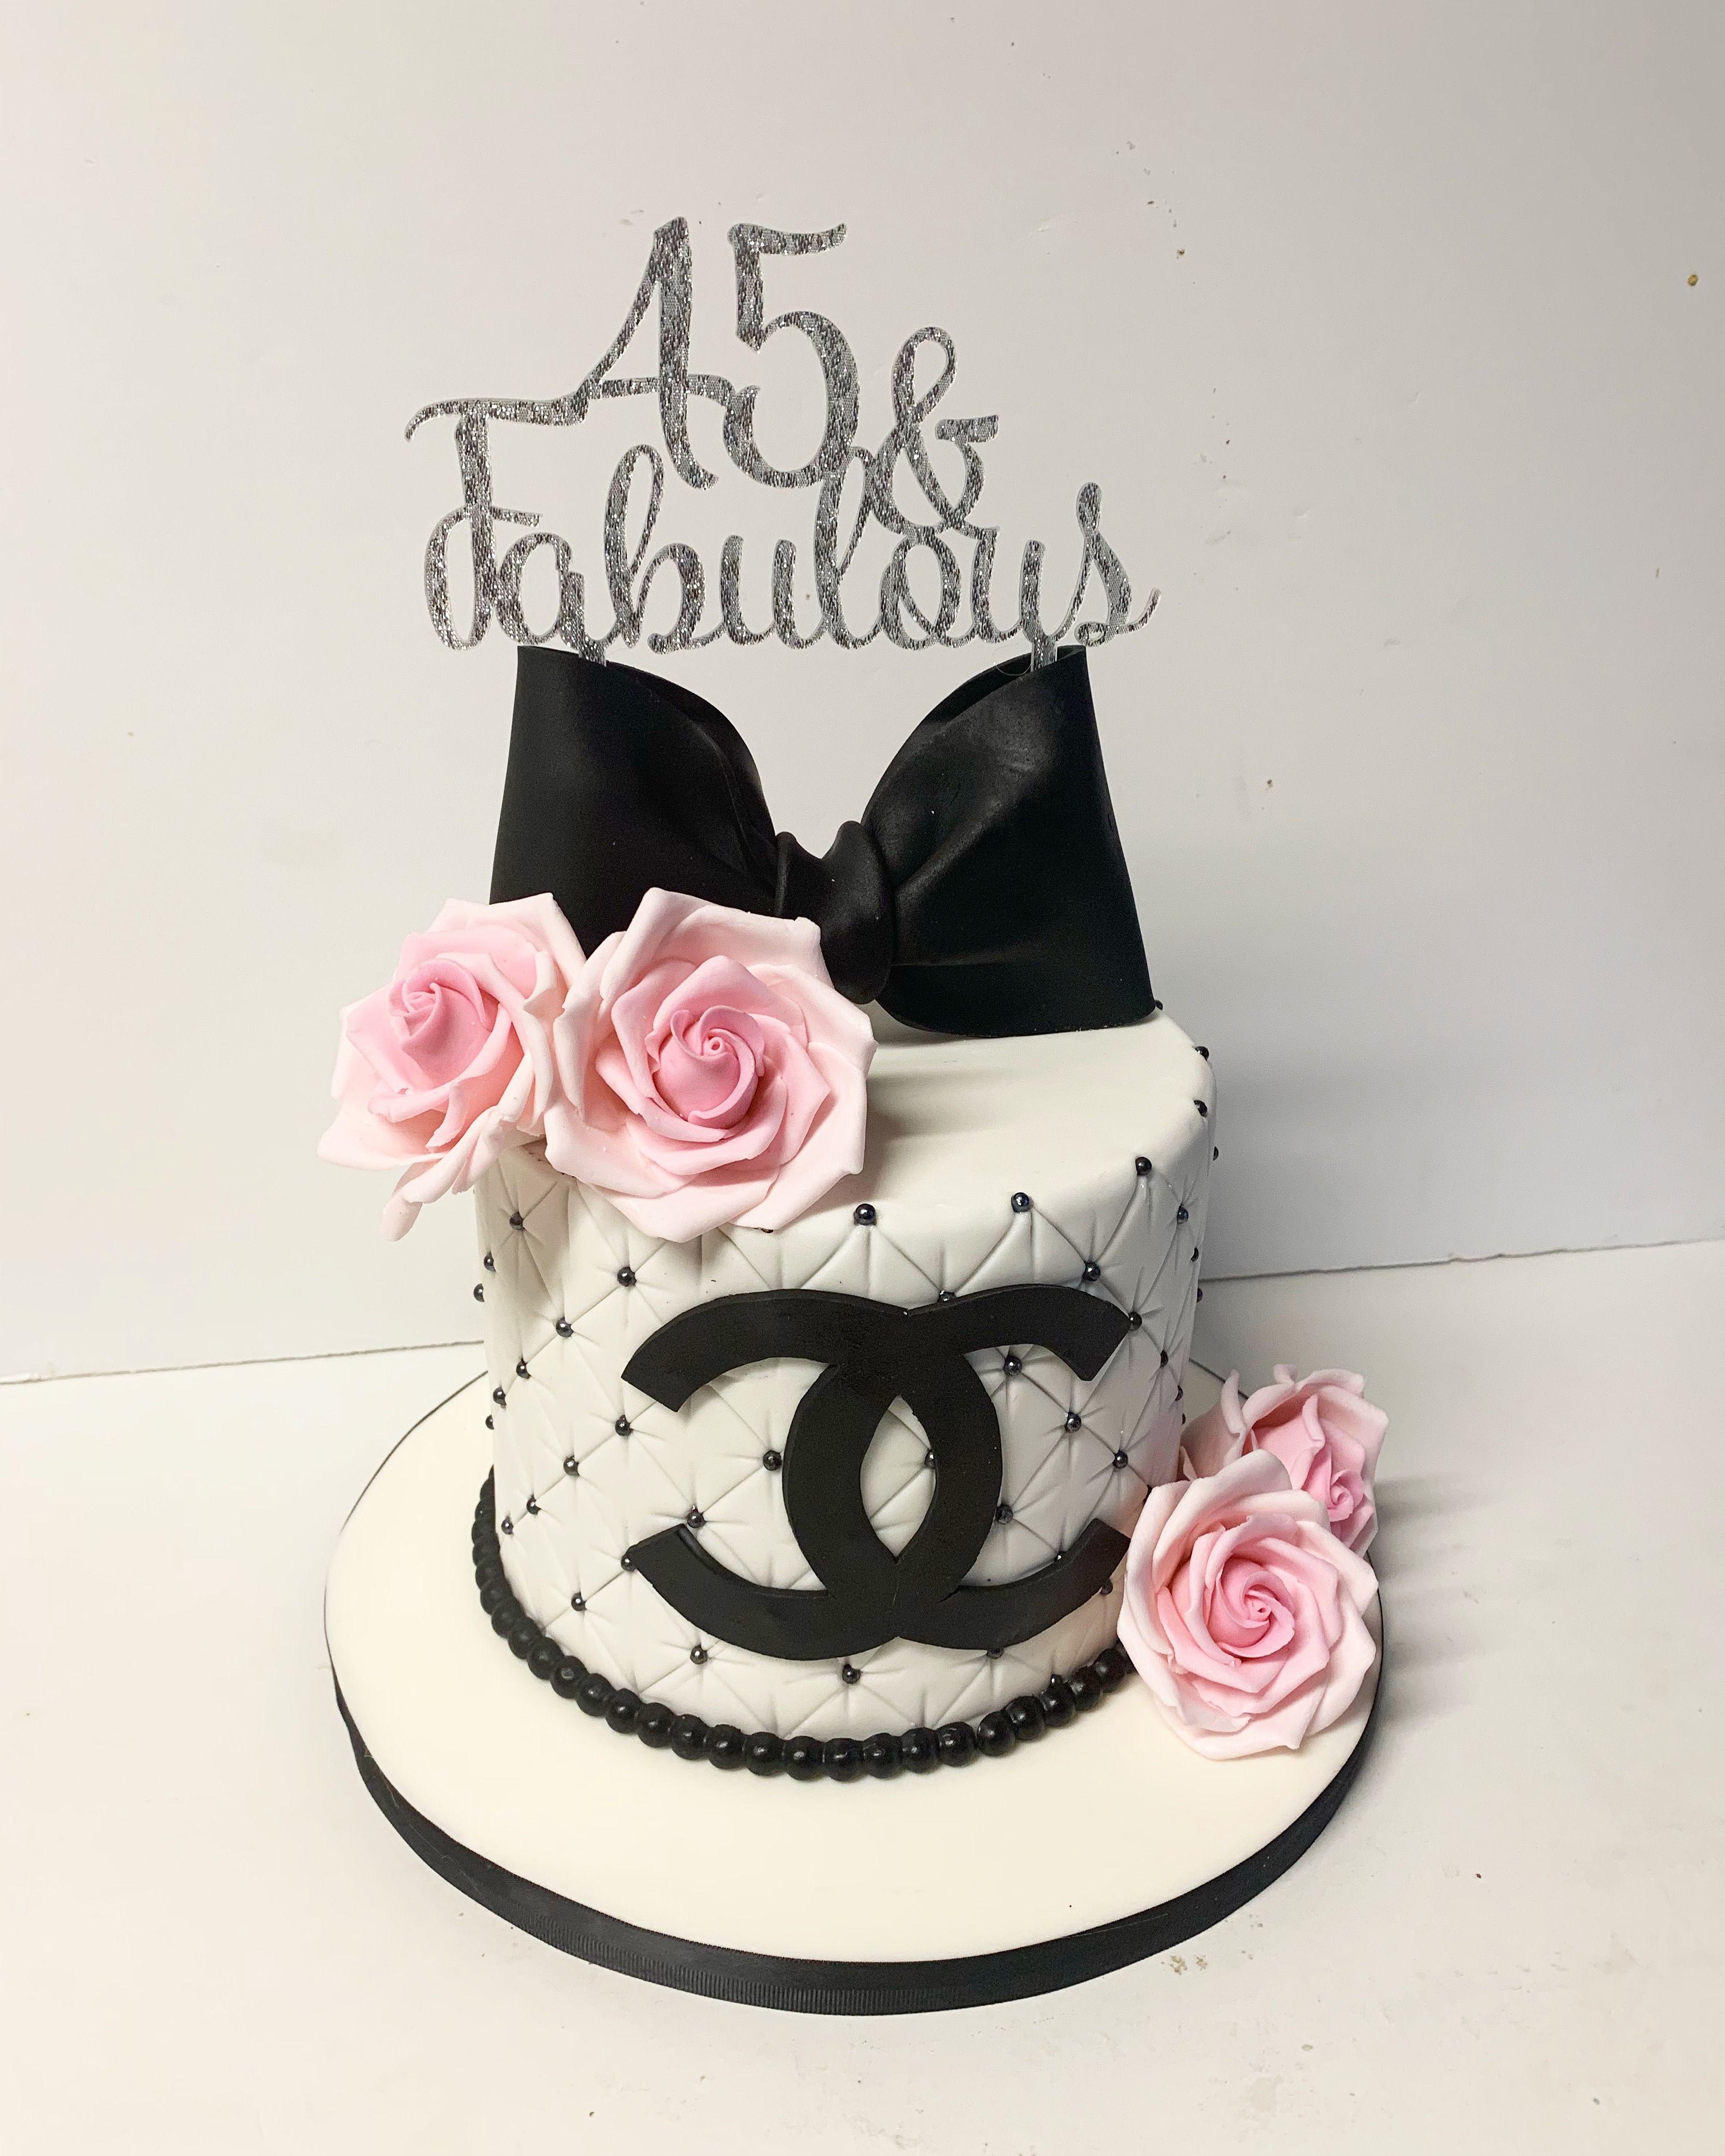 chanel birthday cake images